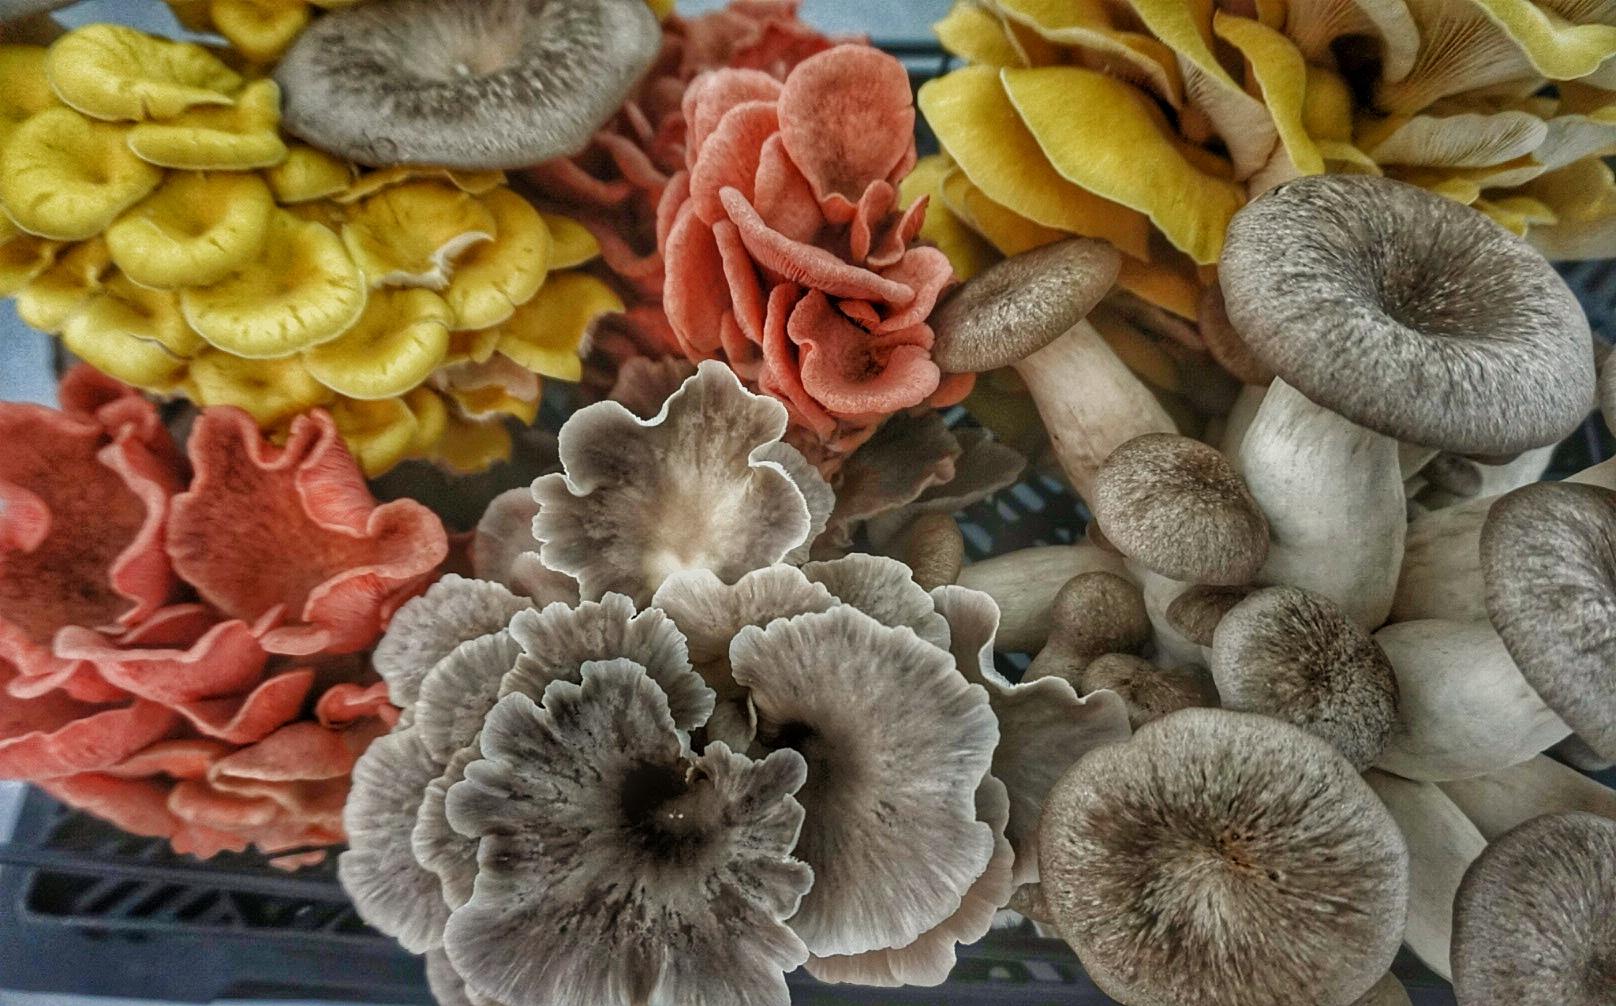 8 oz Mushroom Share